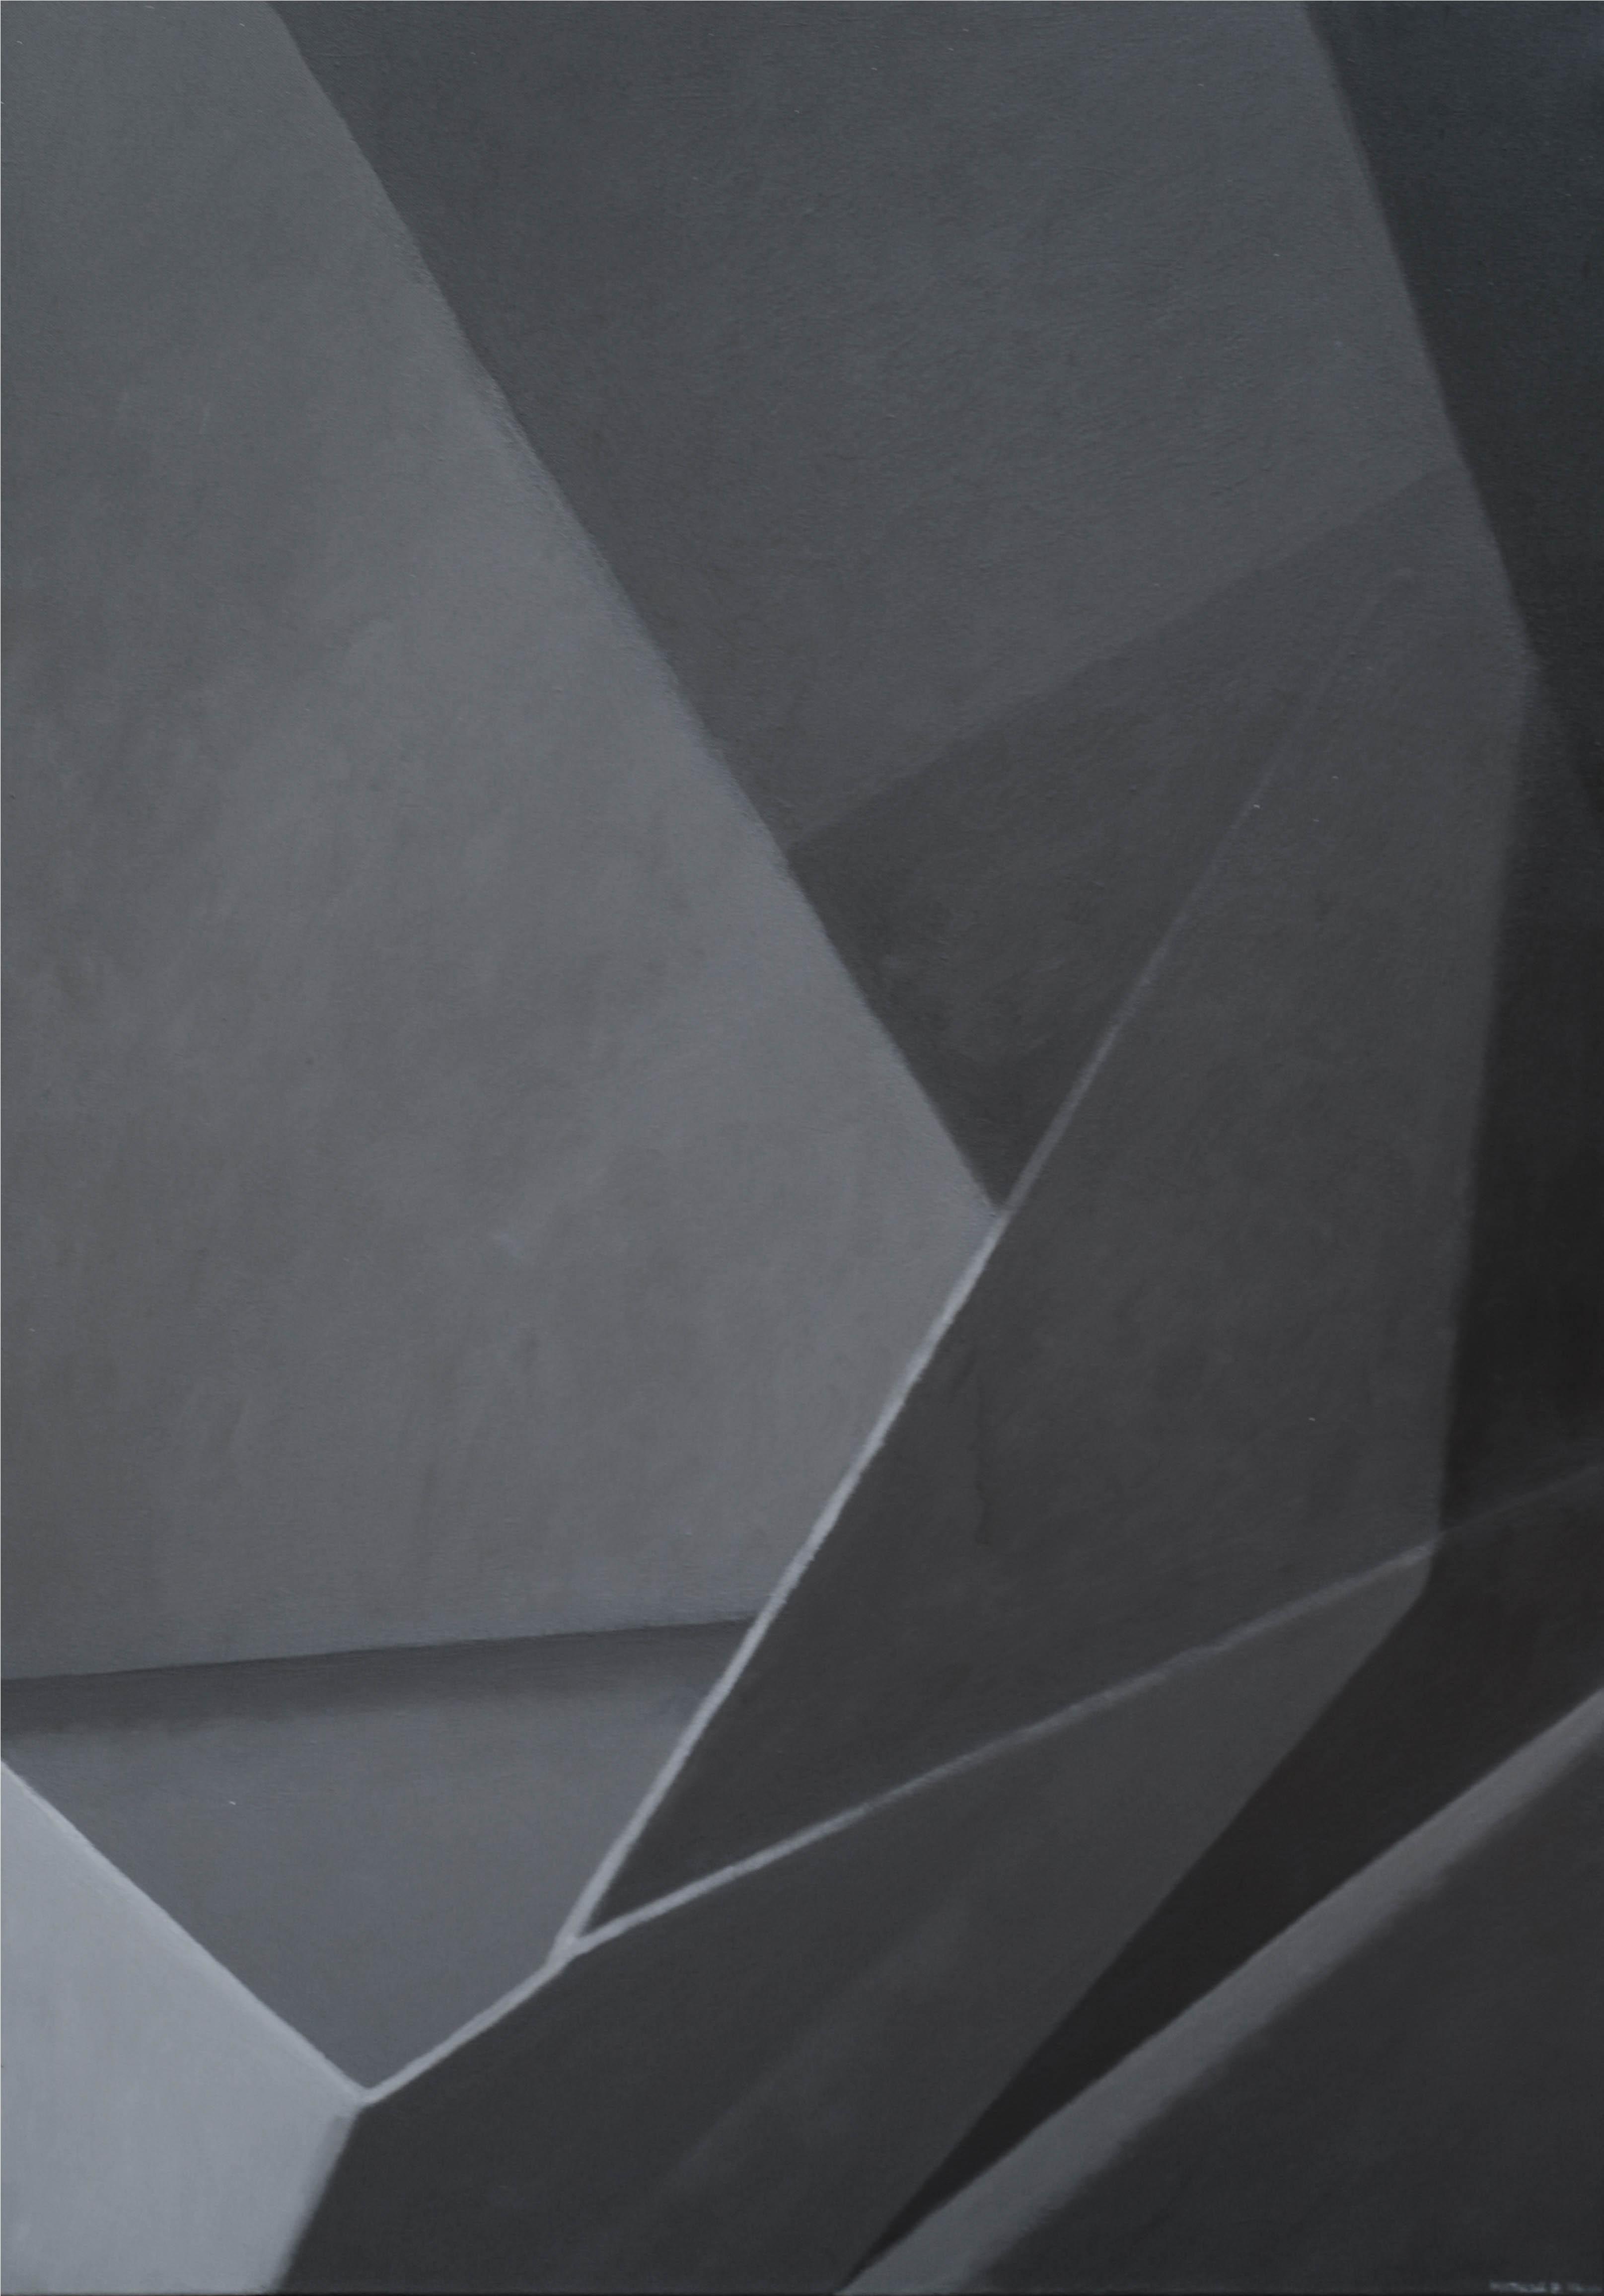 Cienie, 2014